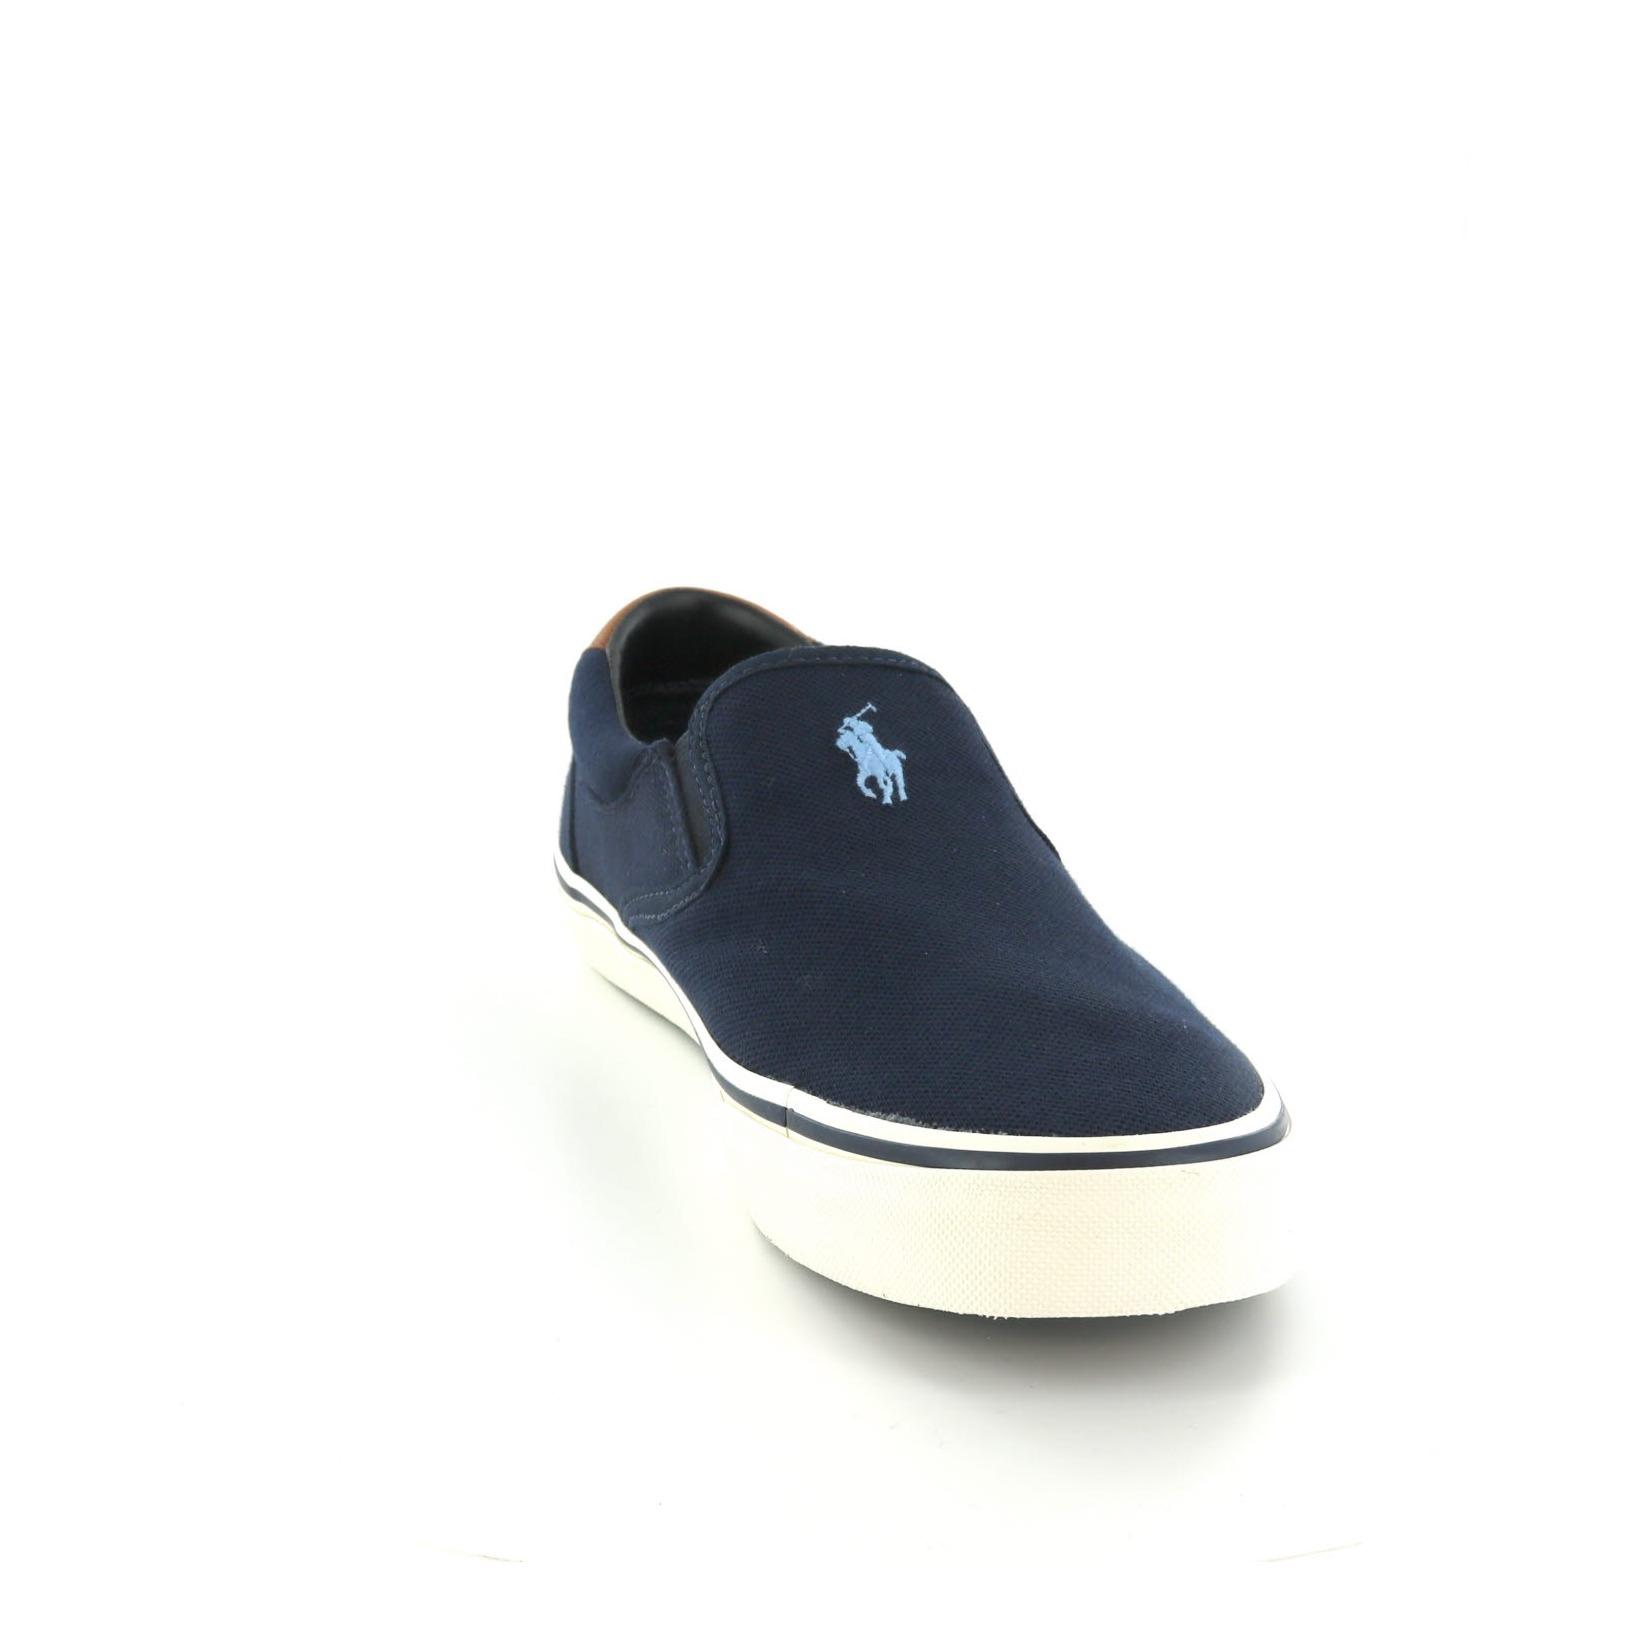 Polo Ralph Lauren / Mocassini, Blu